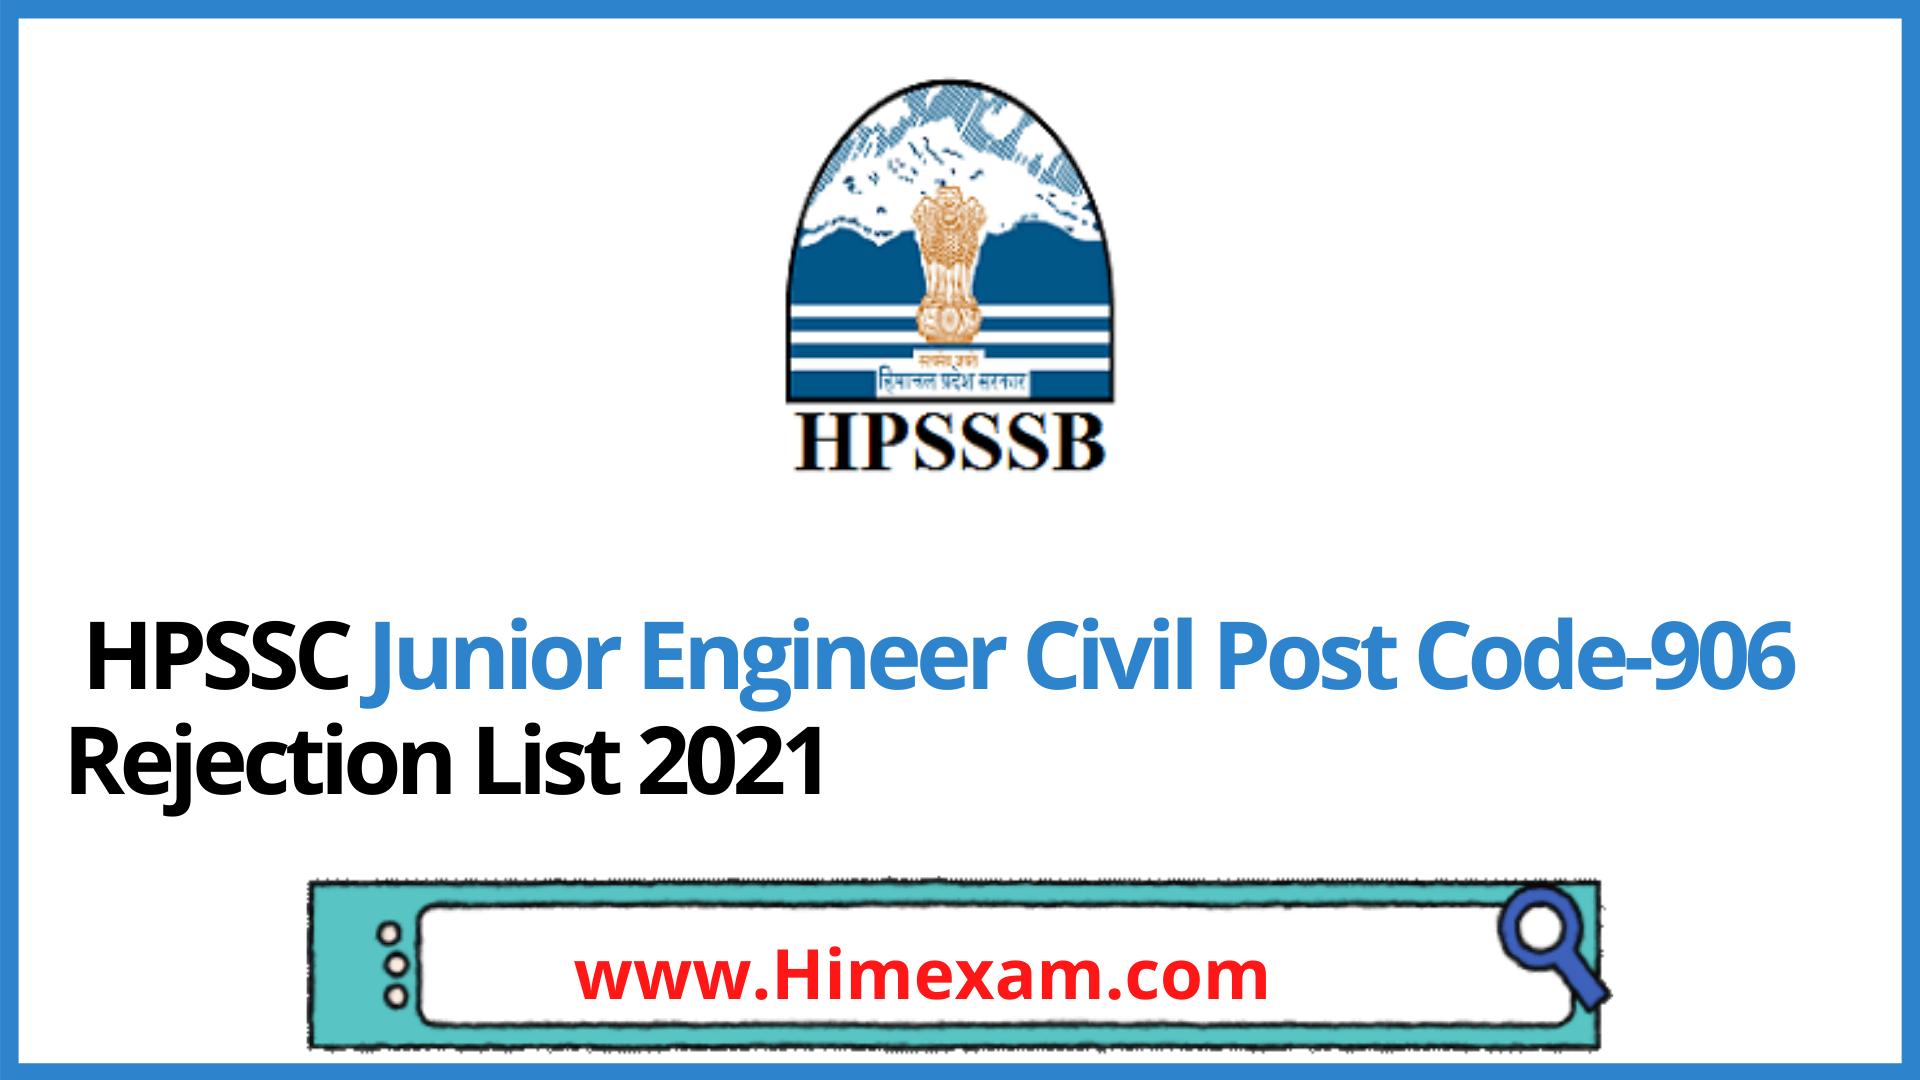 HPSSC Junior Engineer Civil Post Code-906 Rejection List 2021